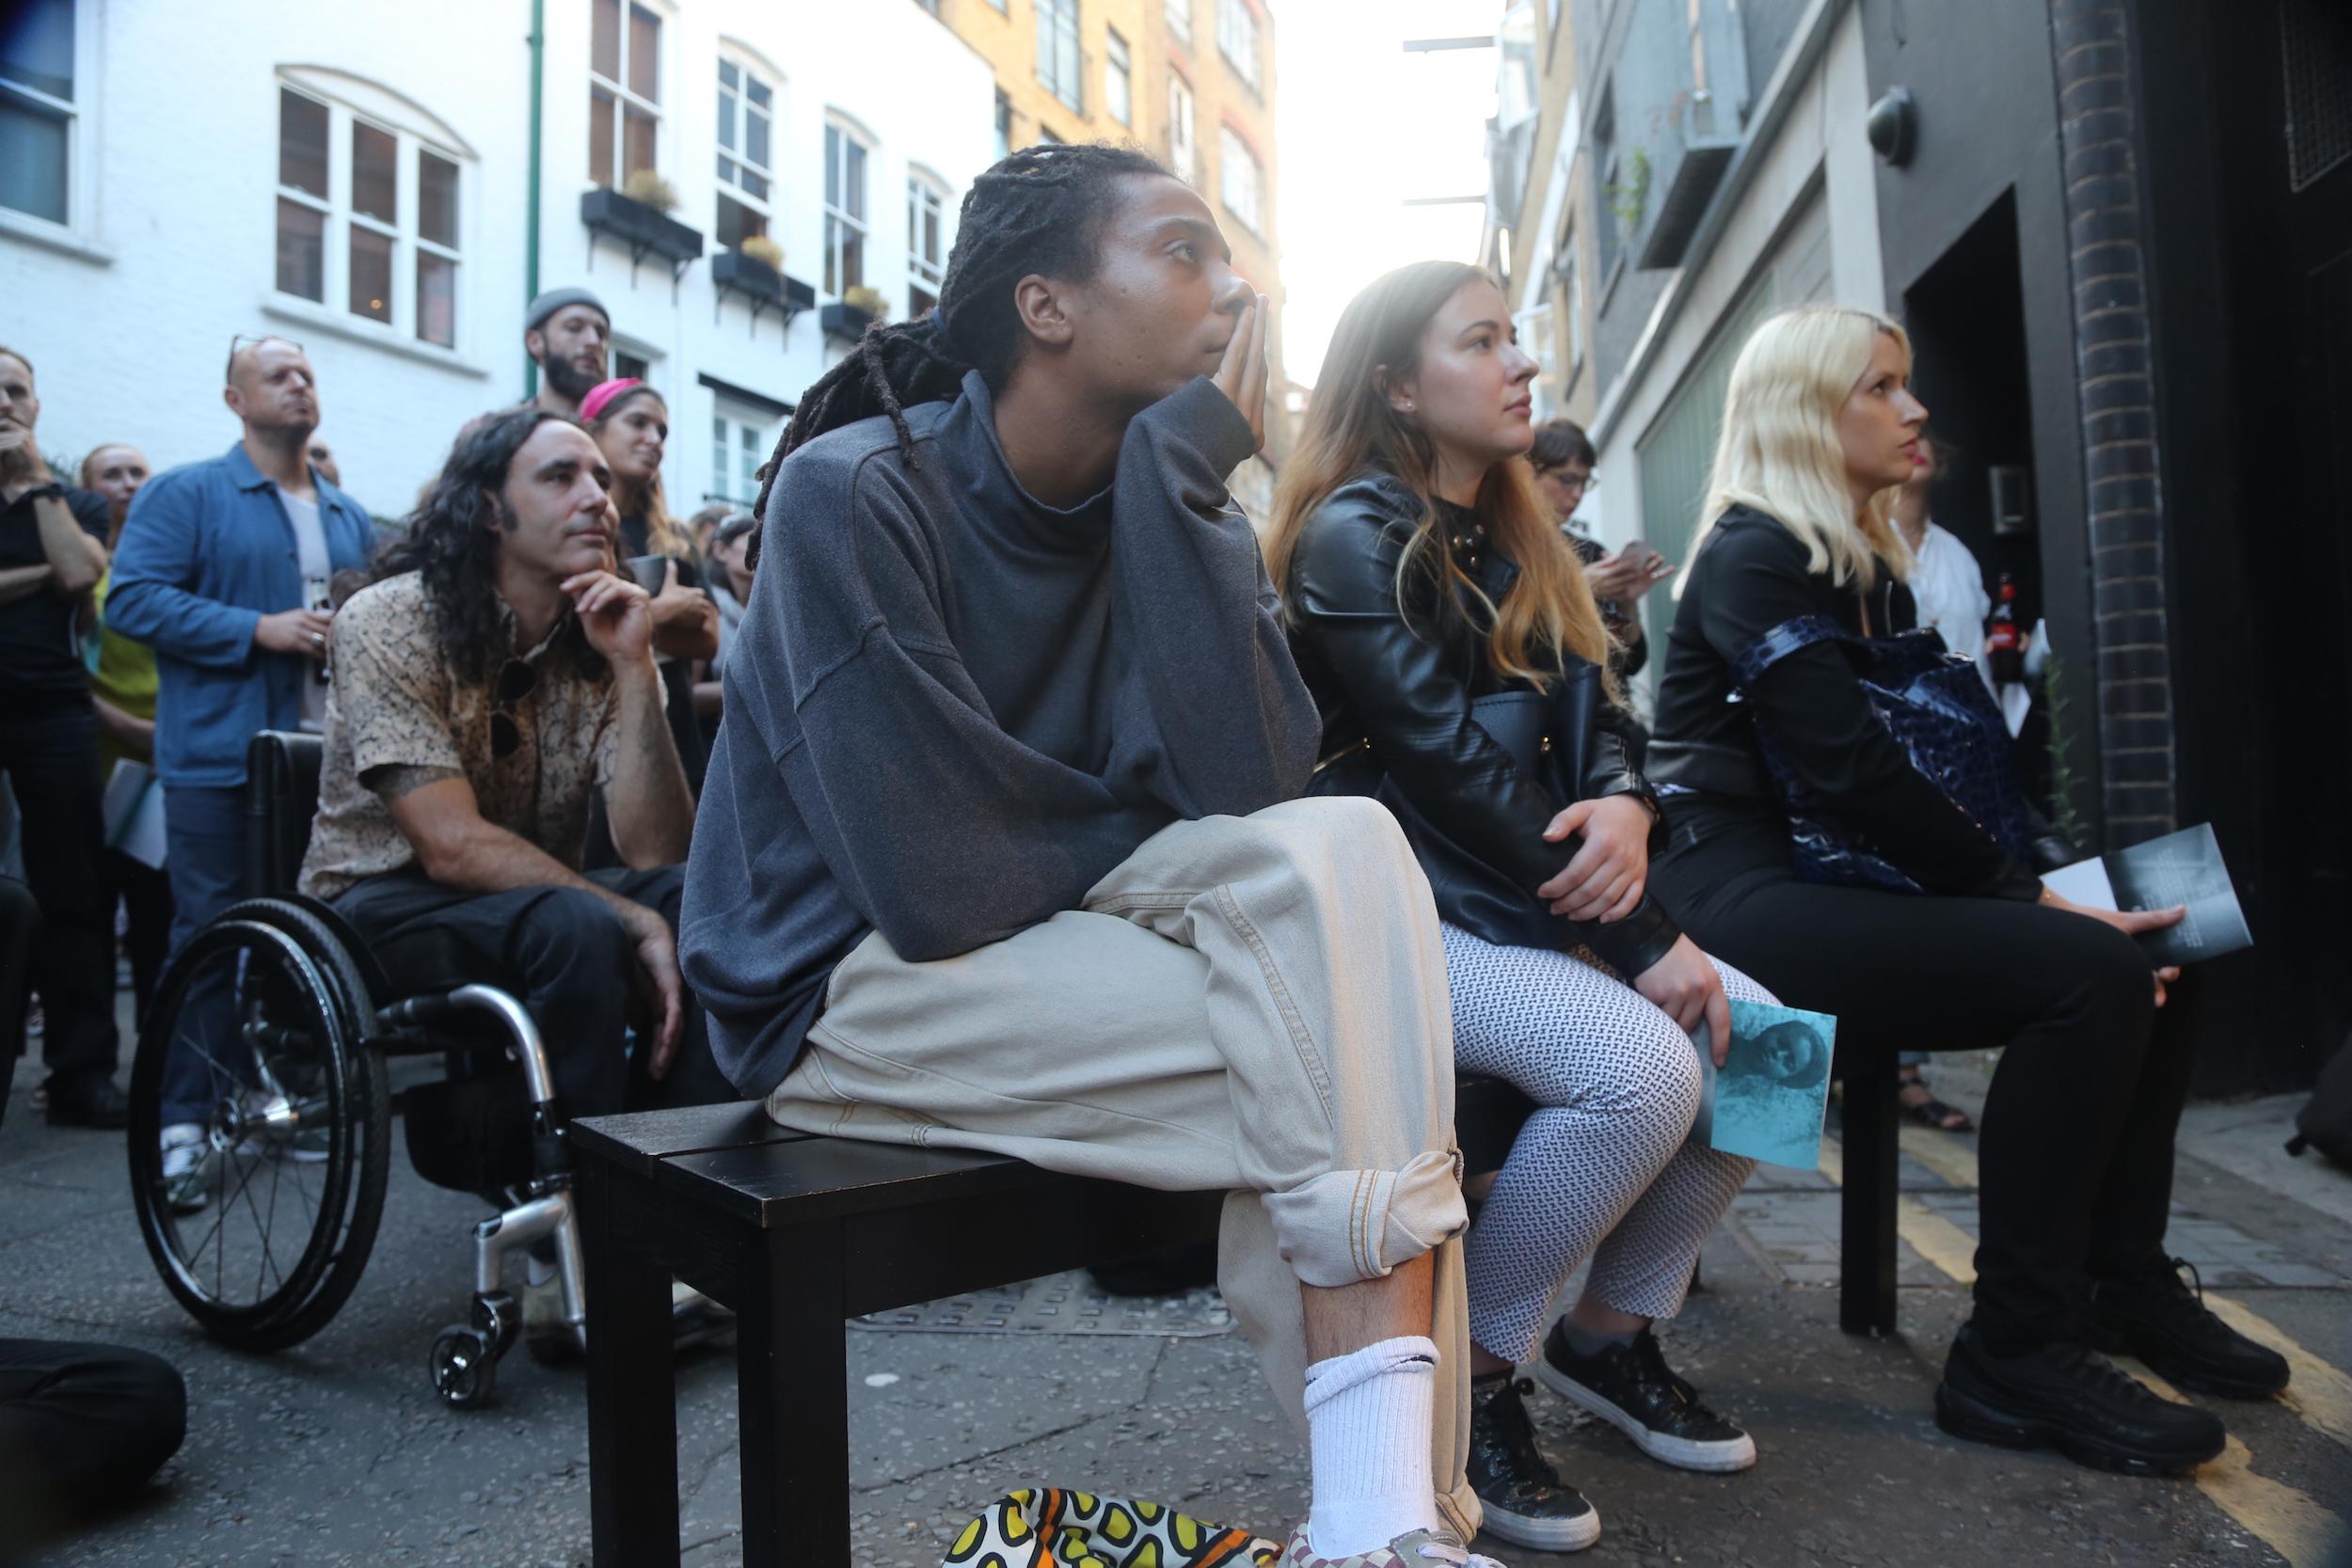 BMNI crowd 1 : © BUREAU.JPG